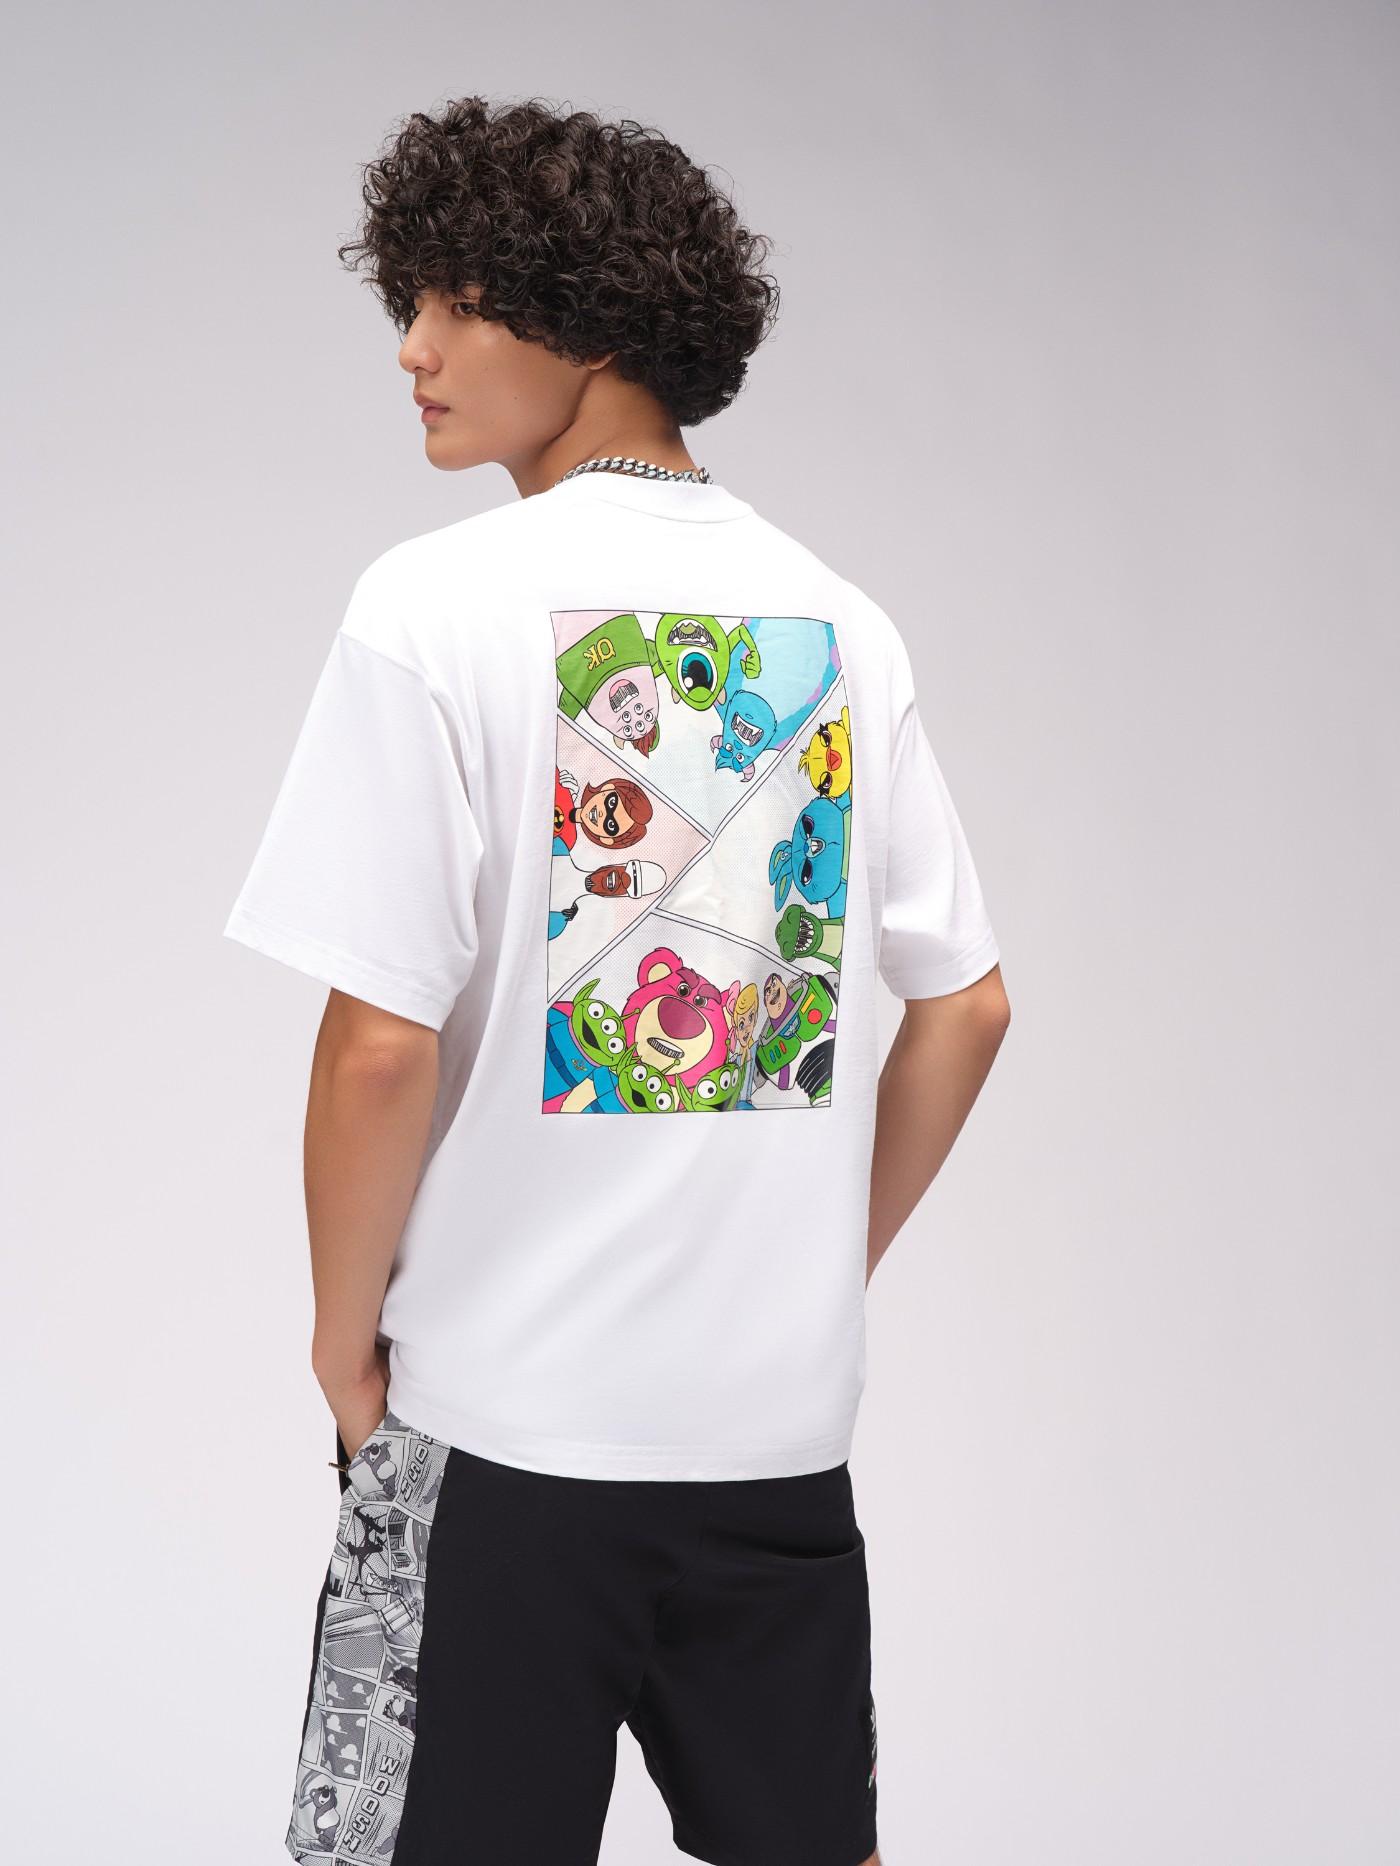 Disney,Pixar,adidas Originals  巴斯光年、大眼仔、草莓熊都有!全新 adidas x 迪士尼系列现已发售!